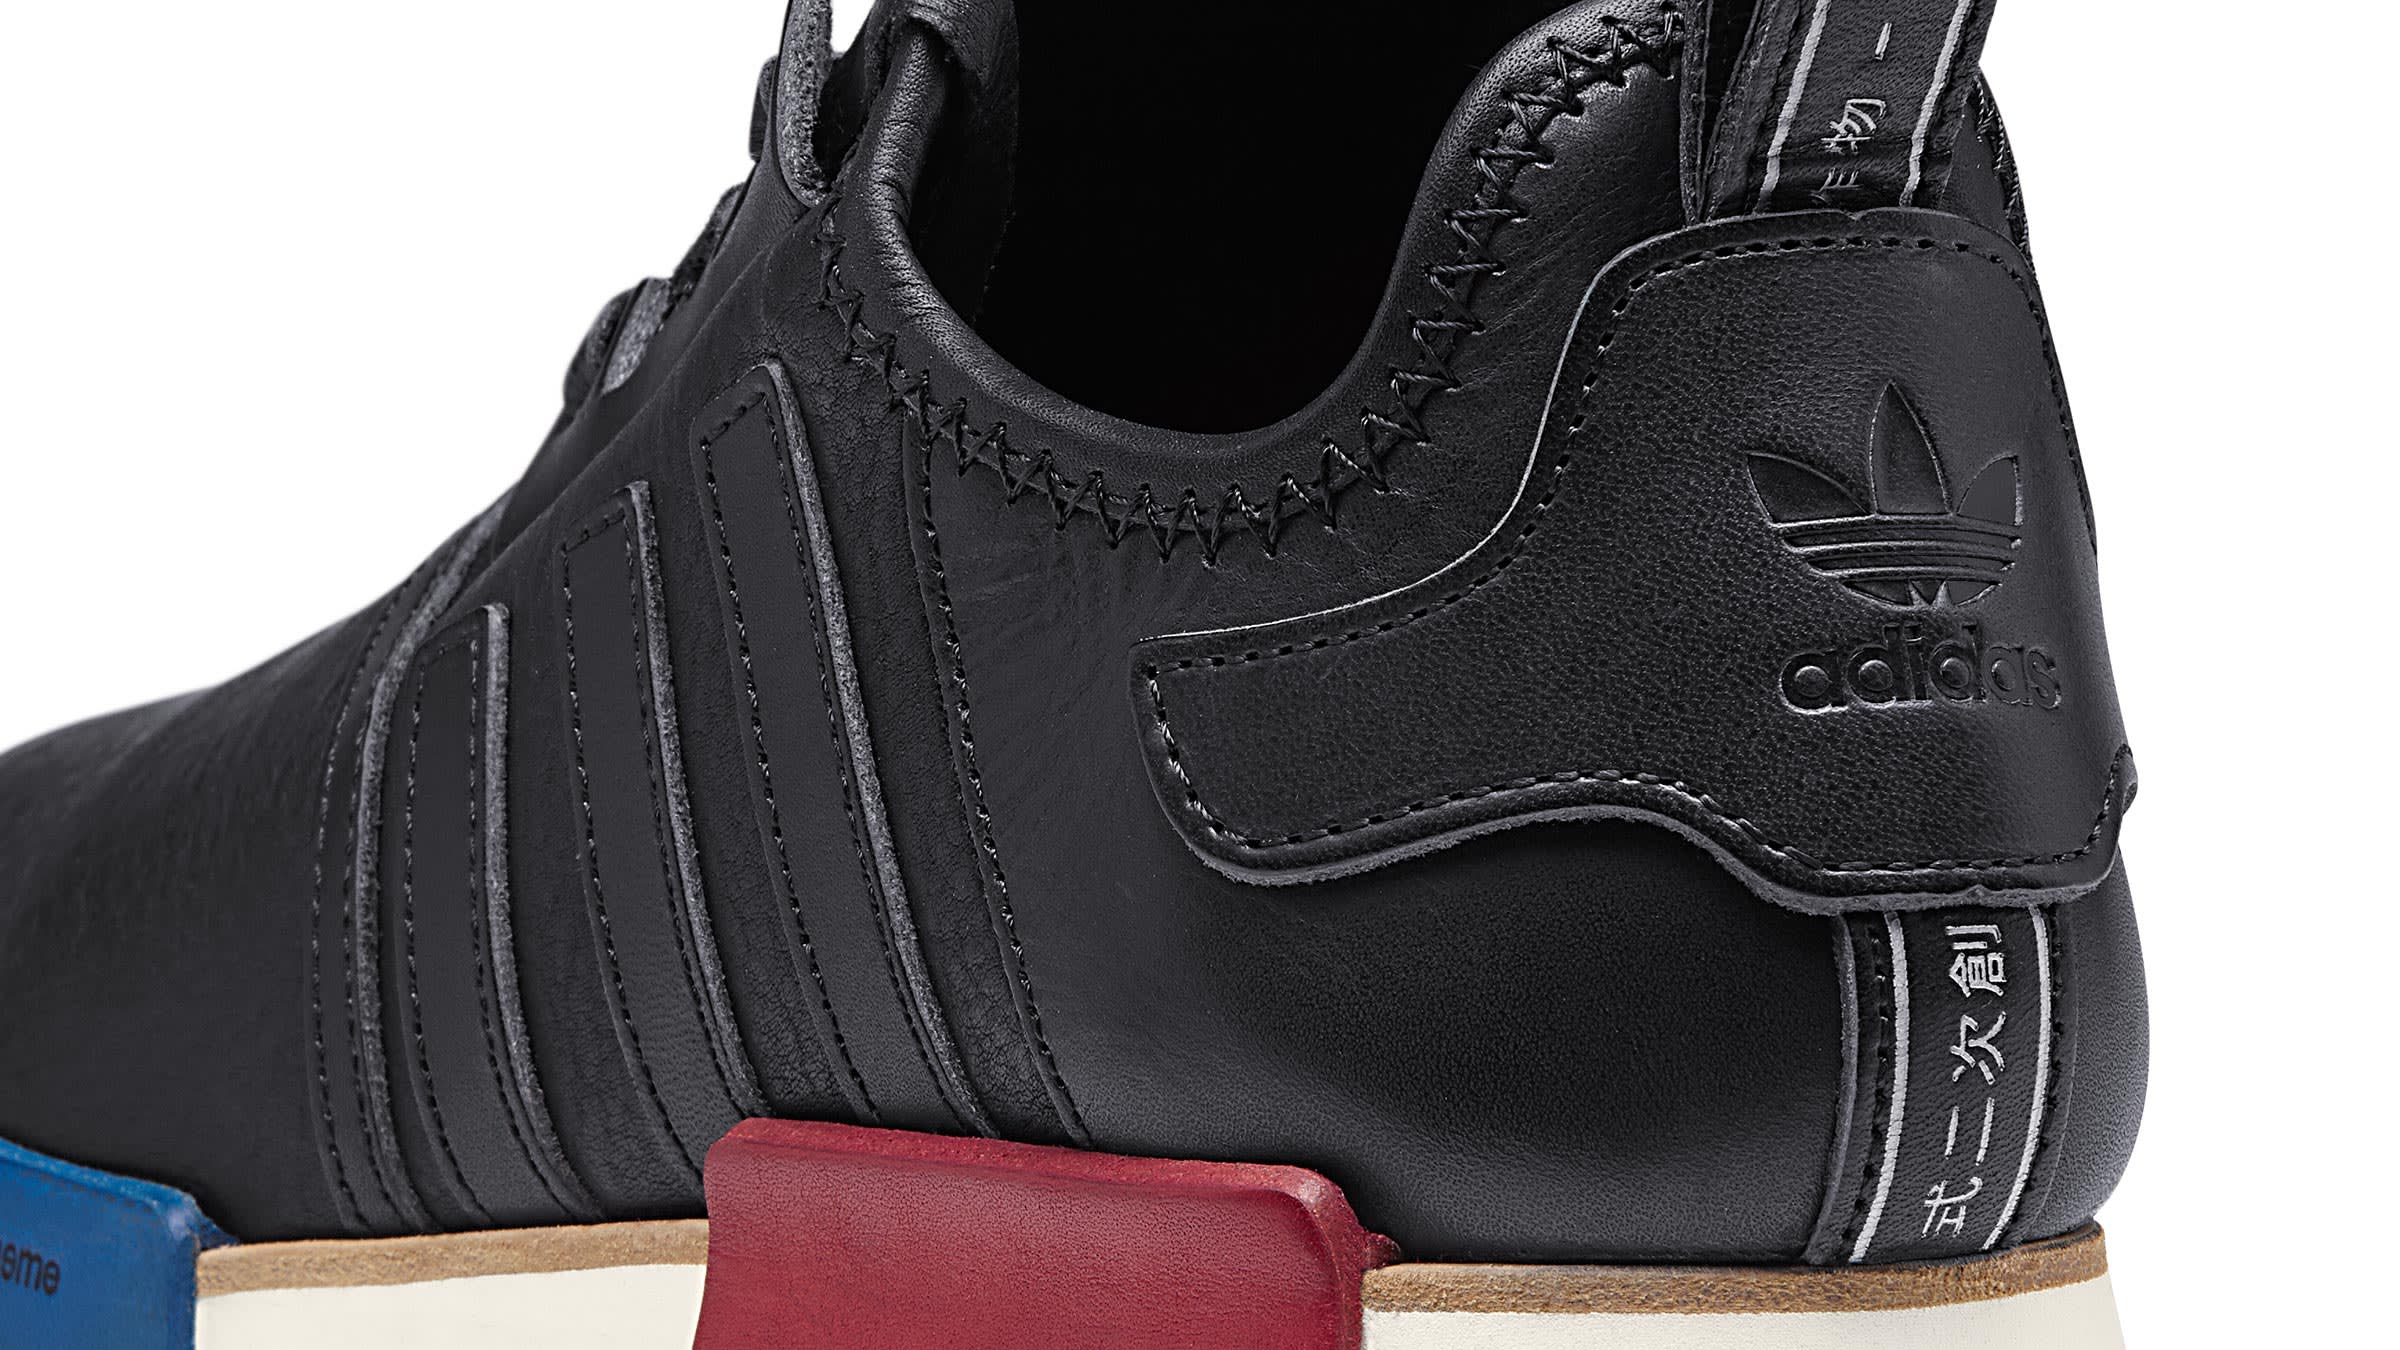 93727044e Adidas x Hender Scheme NMD R1 (Black)